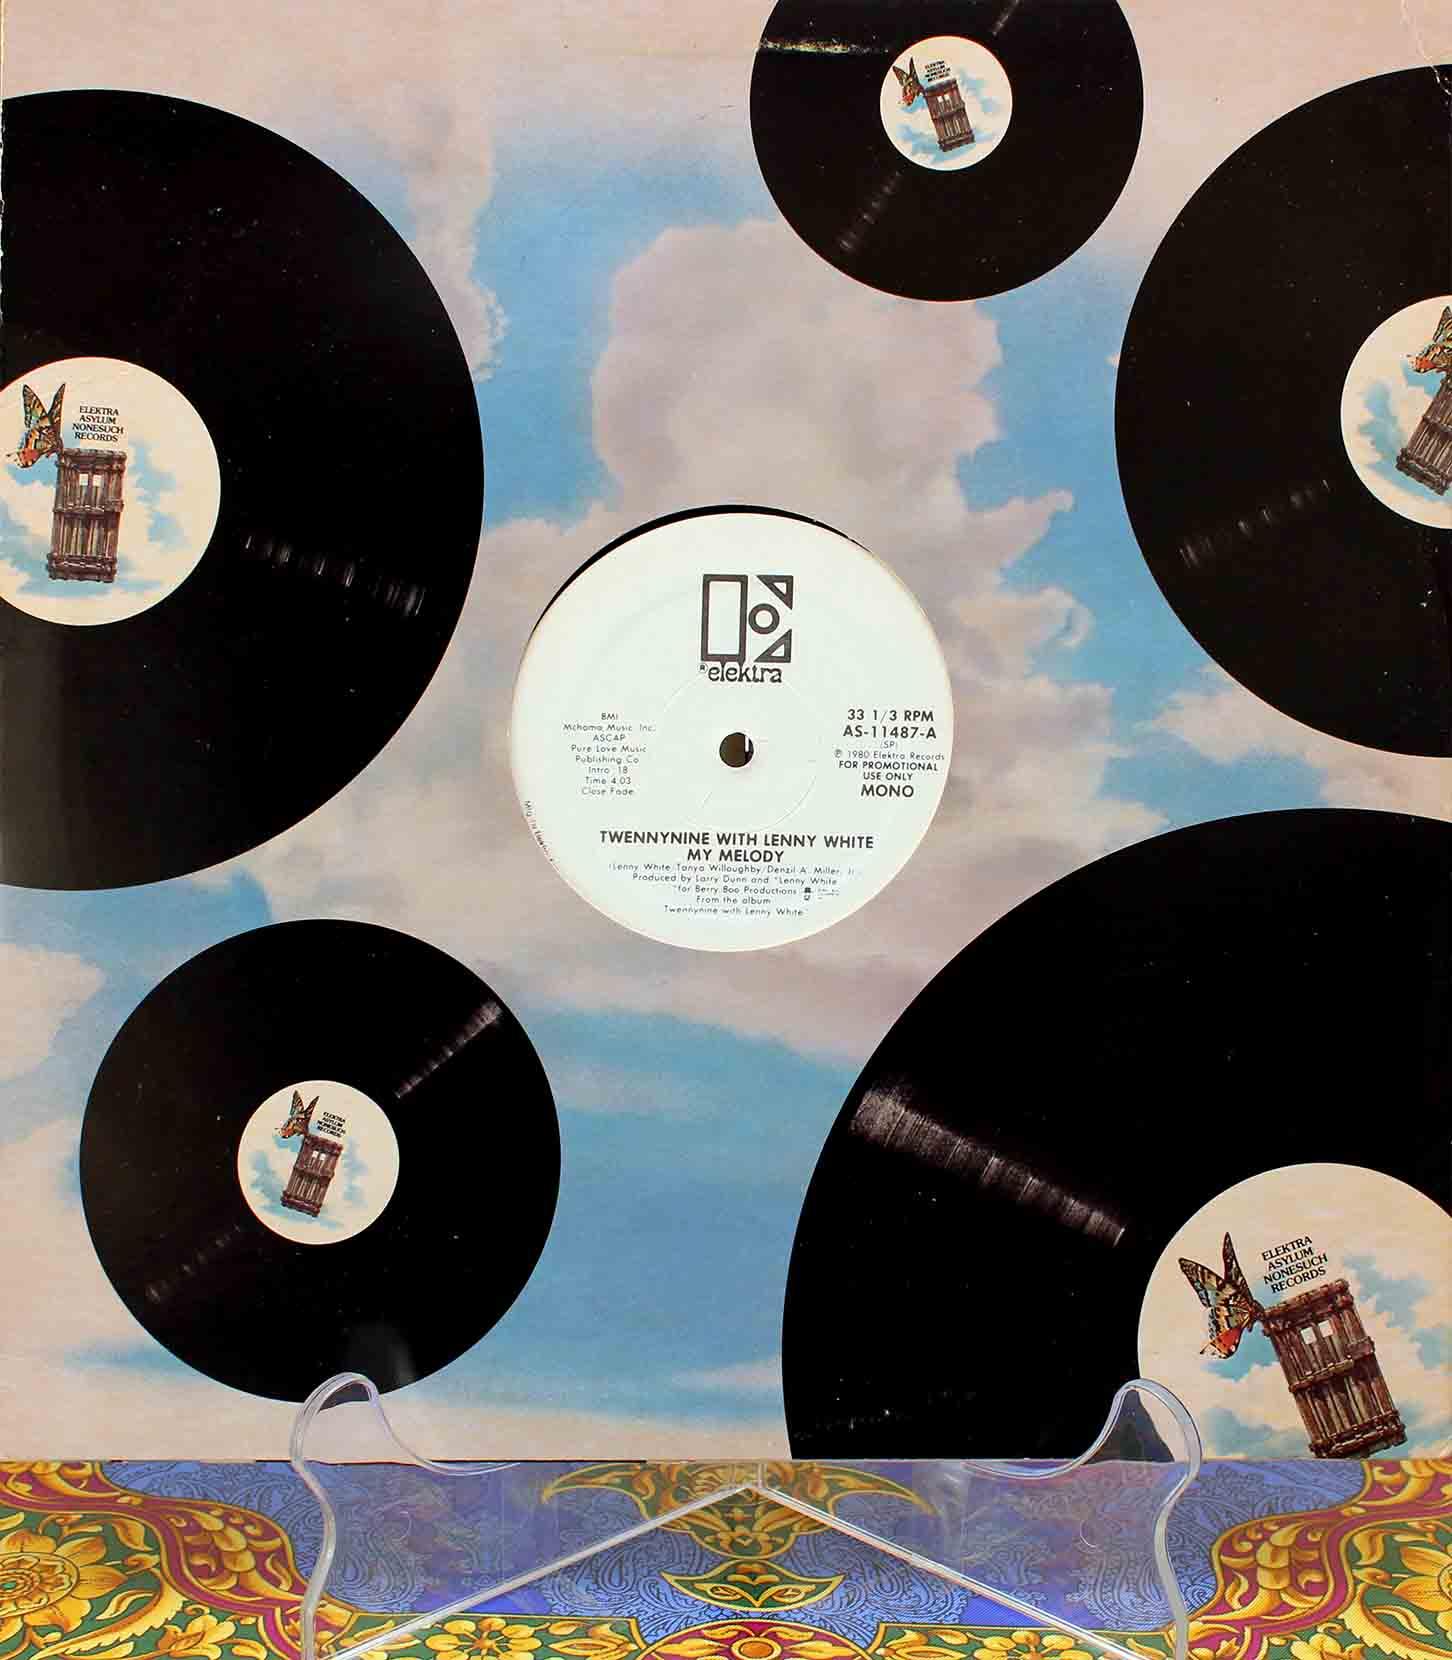 Twennynine With Lenny White – My Melody 02